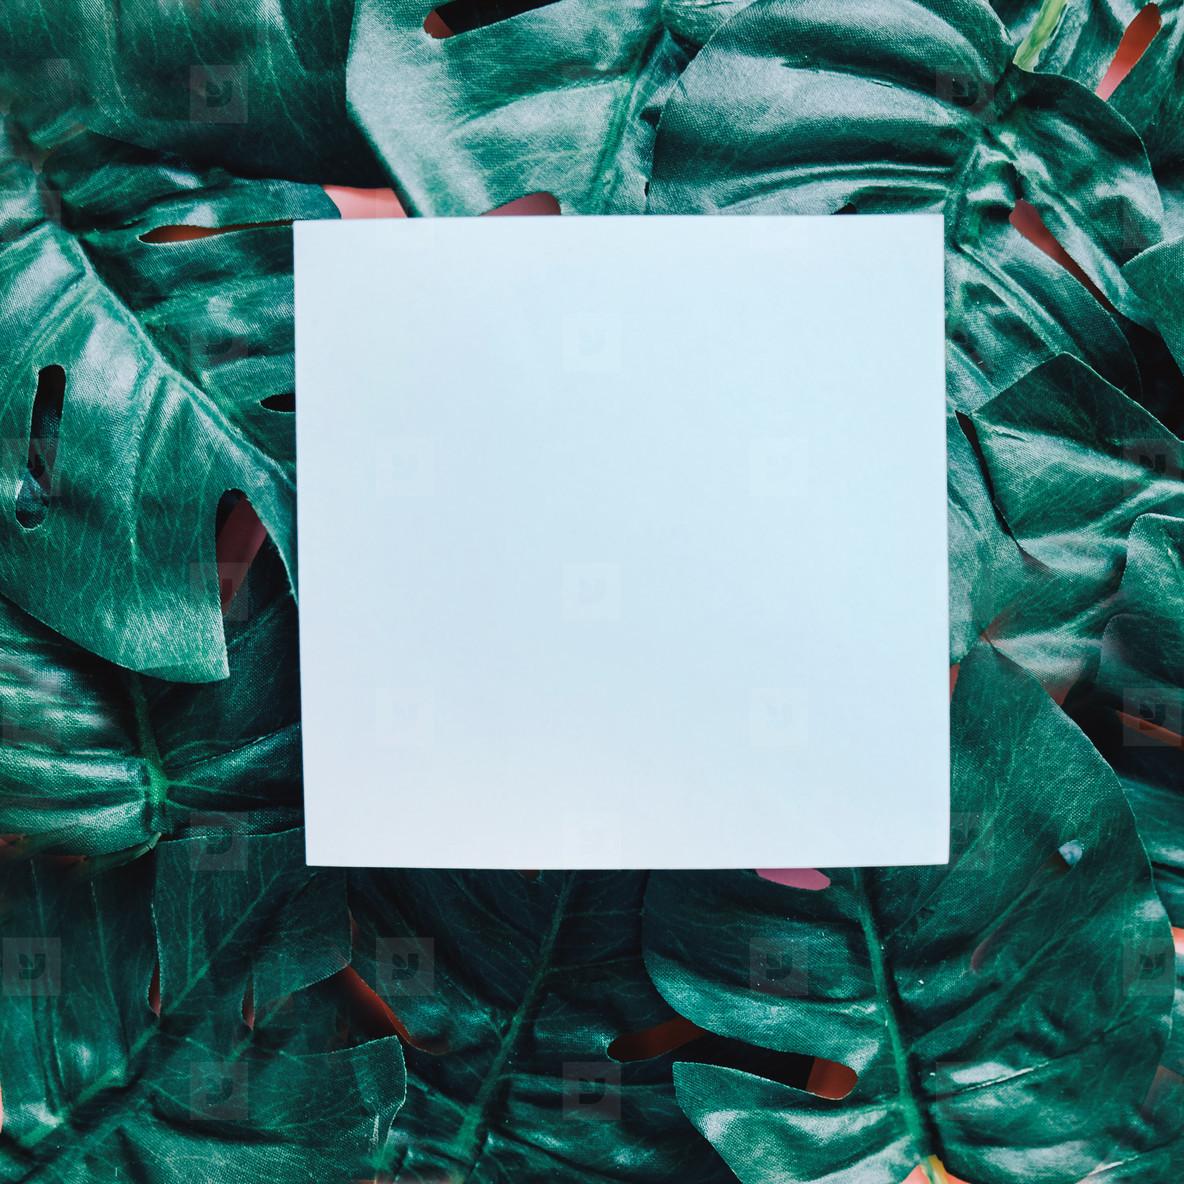 Blank paper ob green leaves